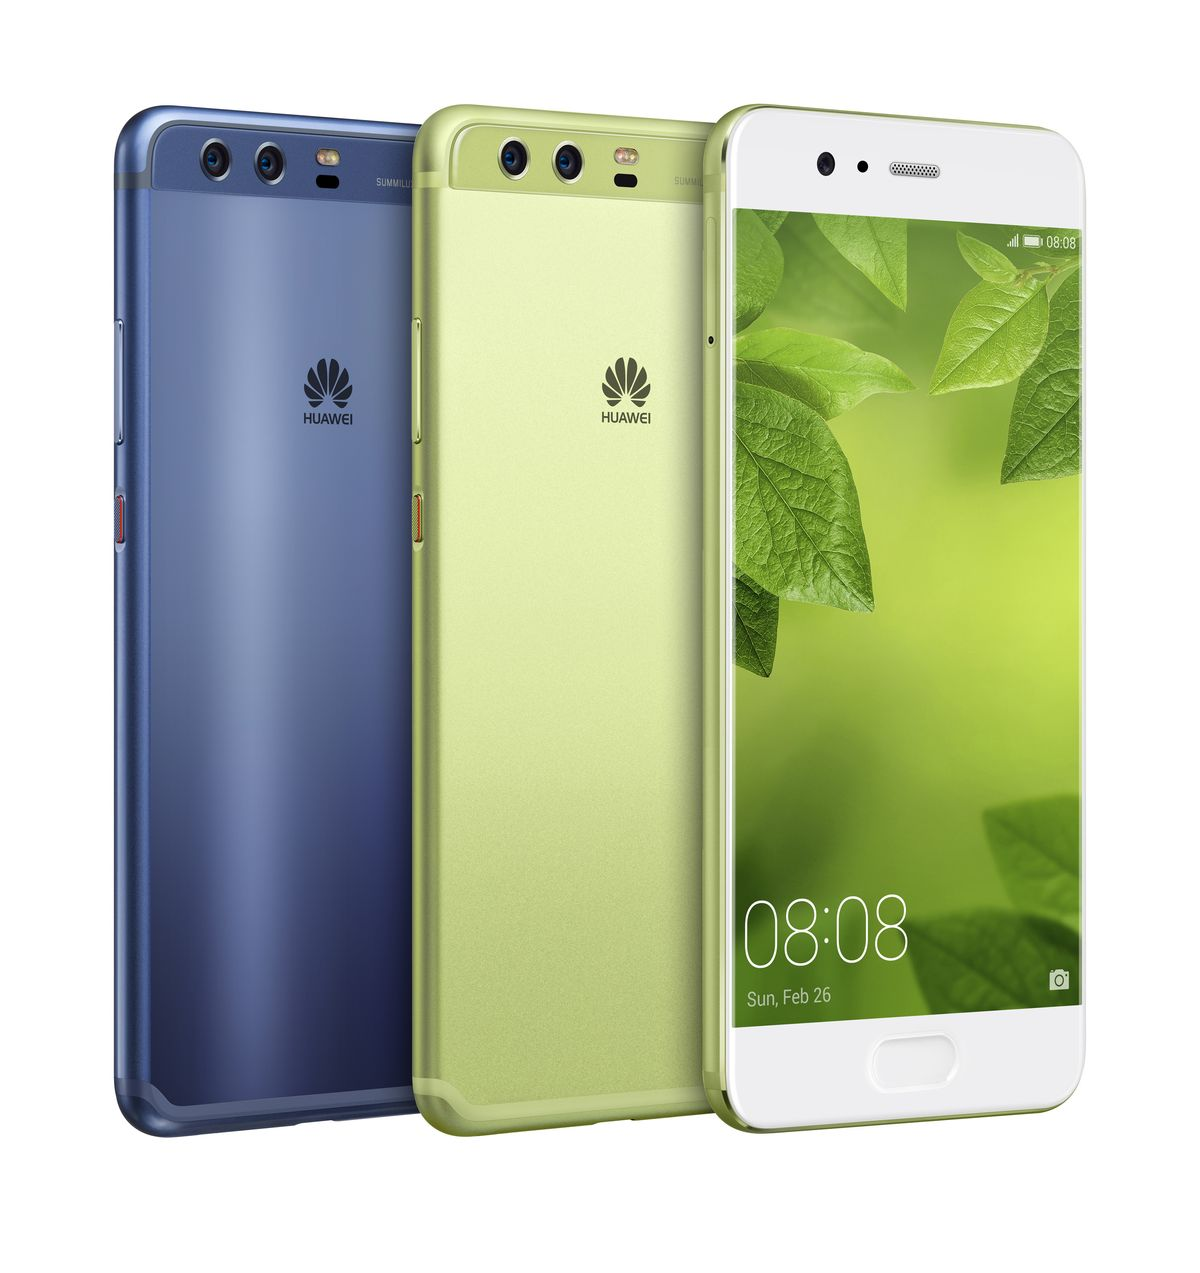 Huawei P10 e P10 Plus: tanta potenza e fotocamera super